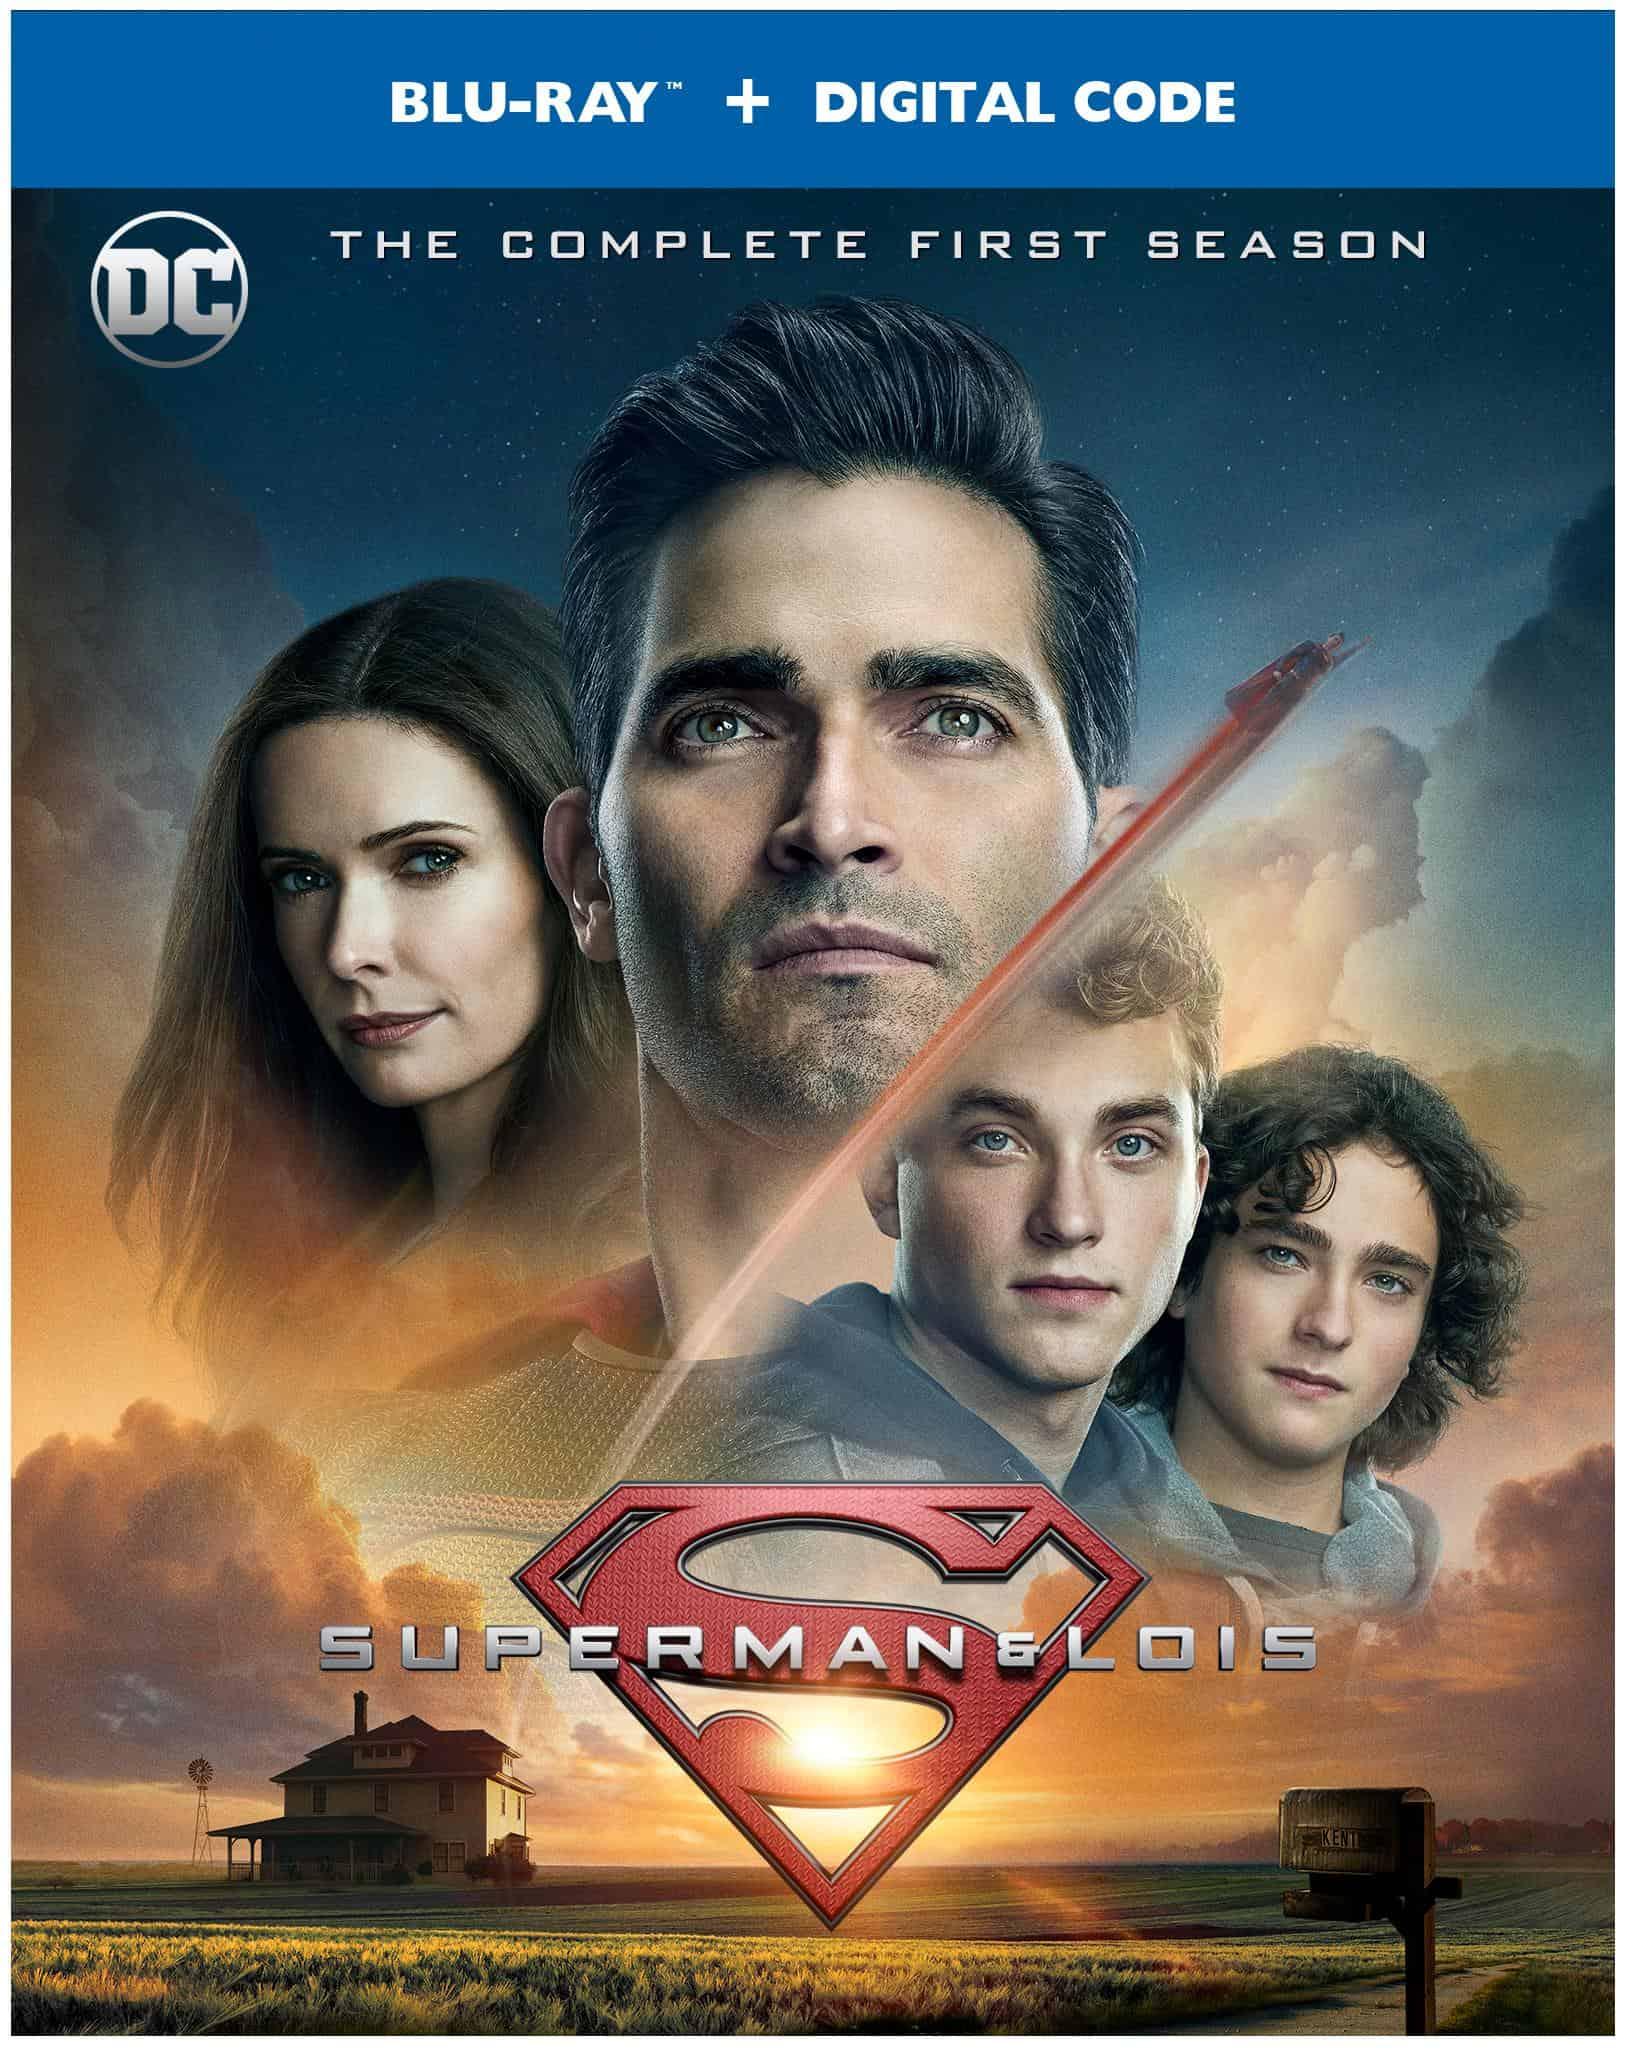 Superman Lois BD